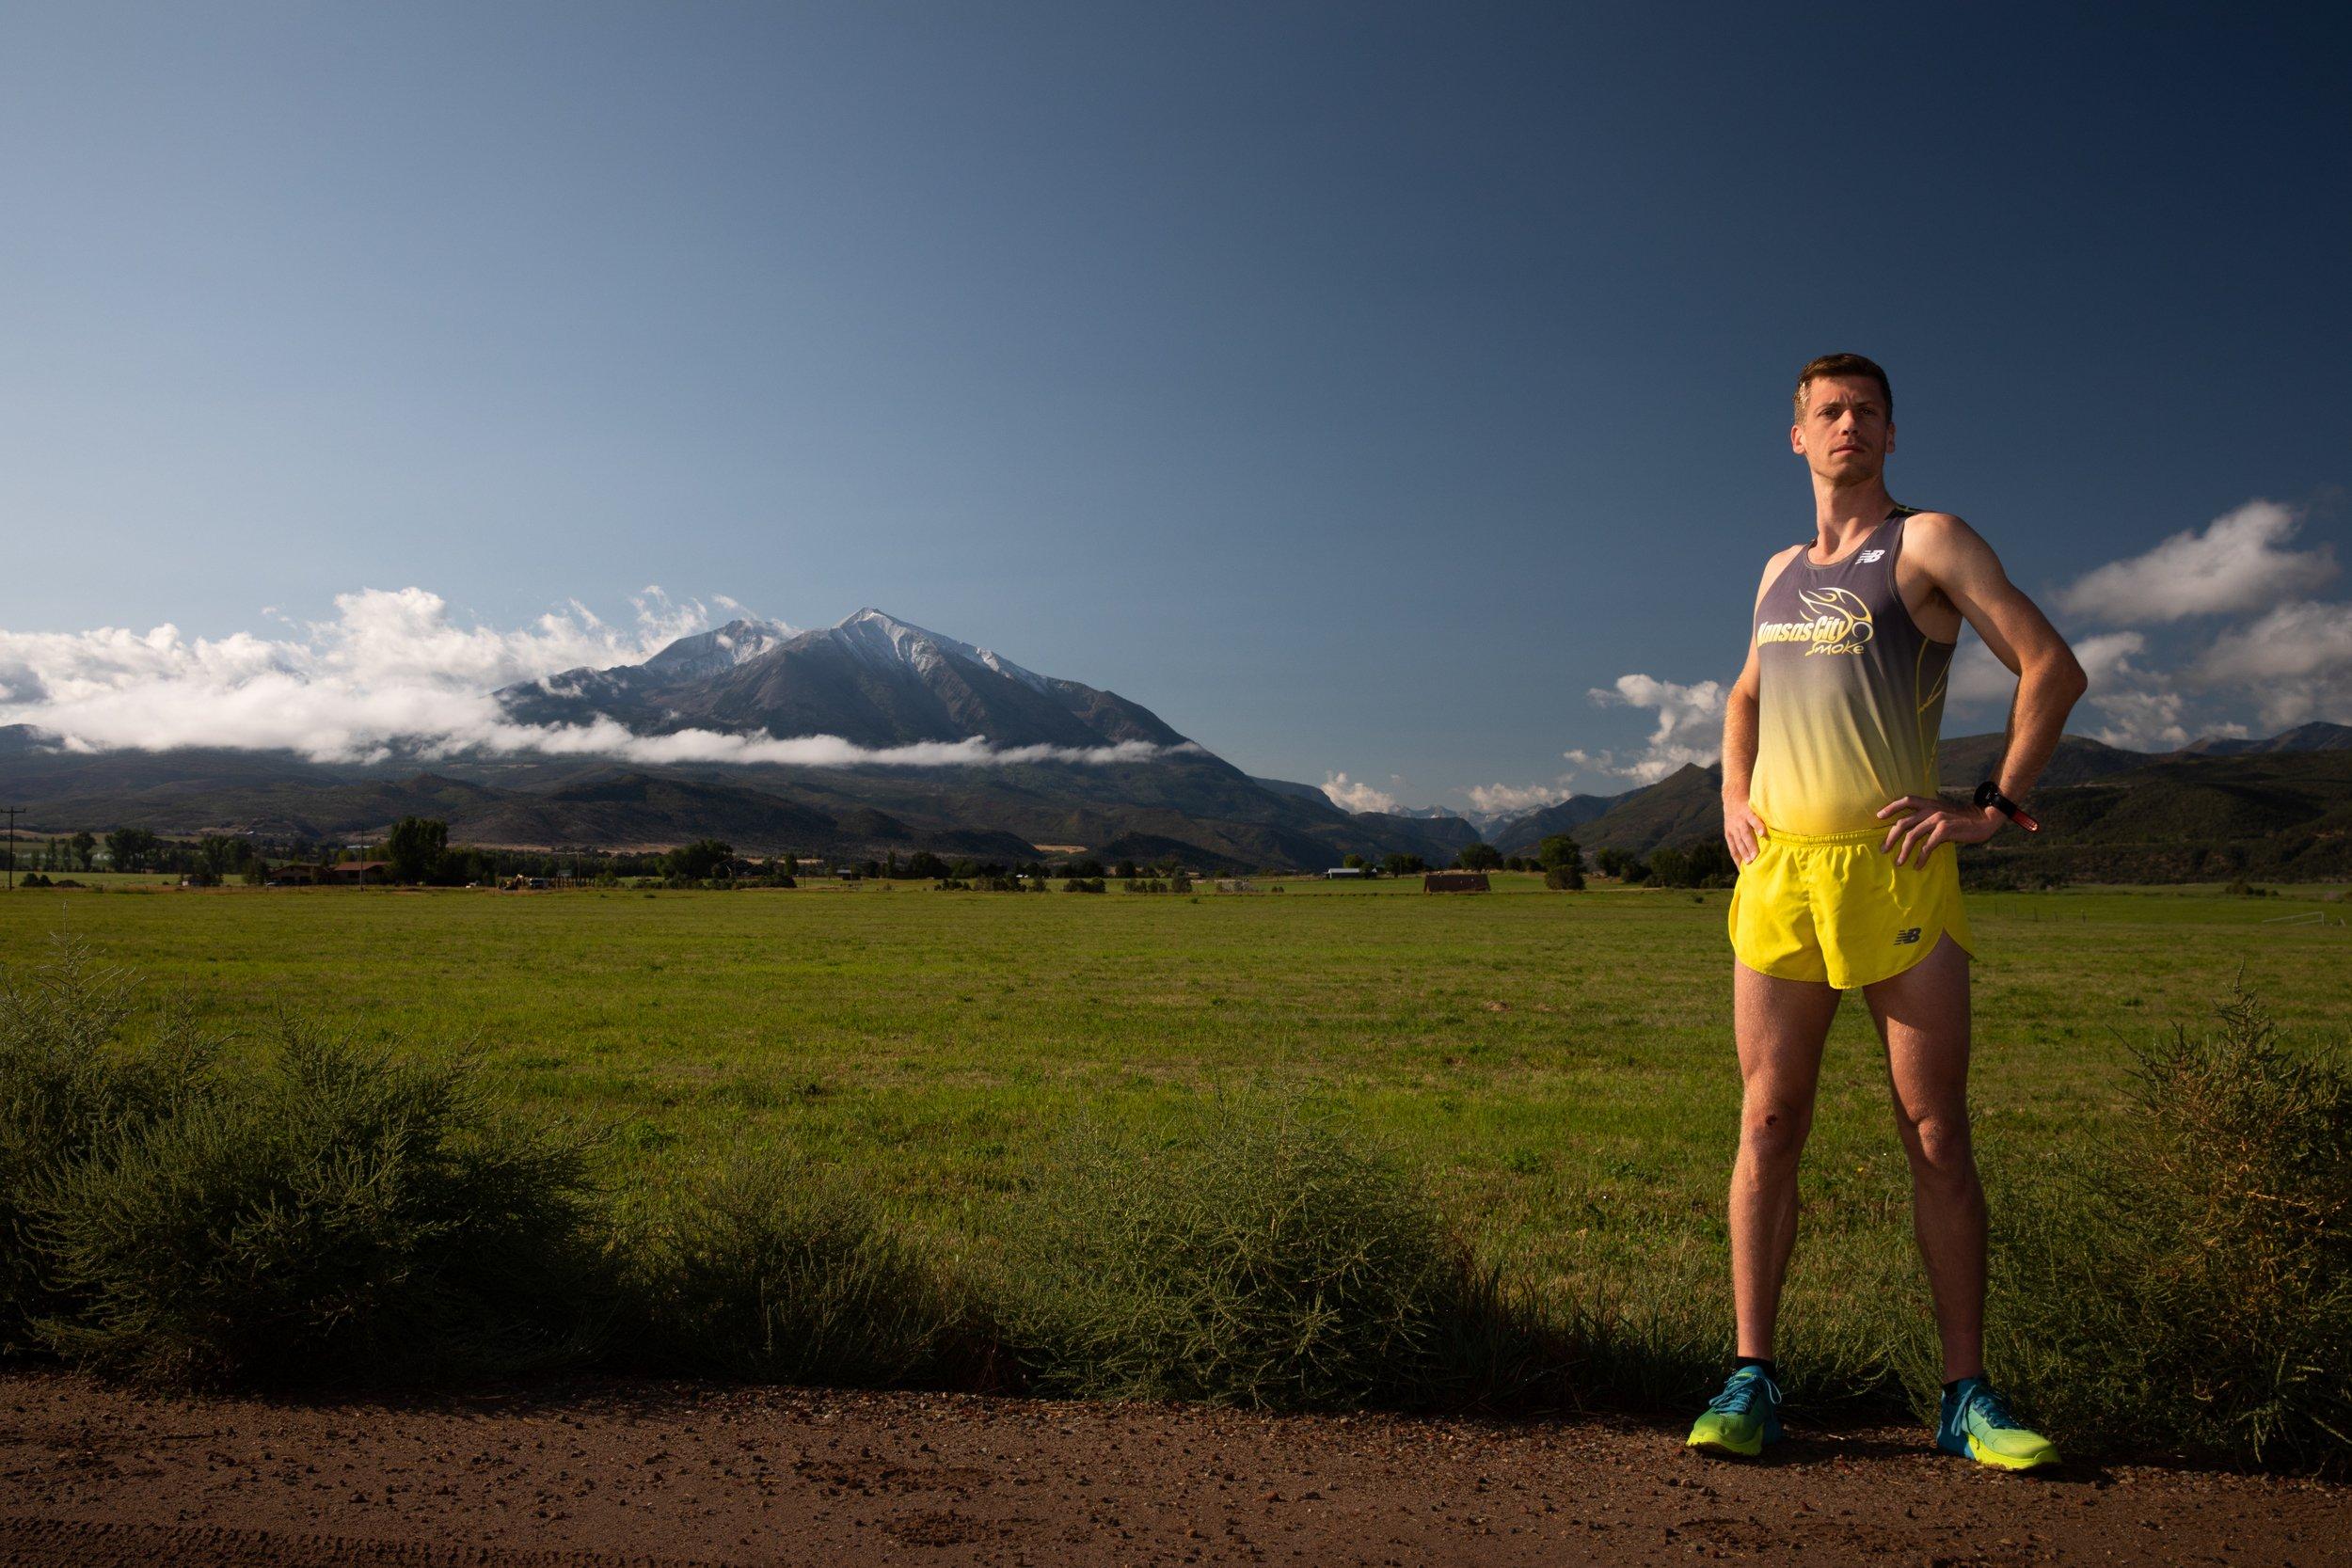 Justin Garrard ran in September to raise awareness for Ascendigo. Photo by Mark Burrows